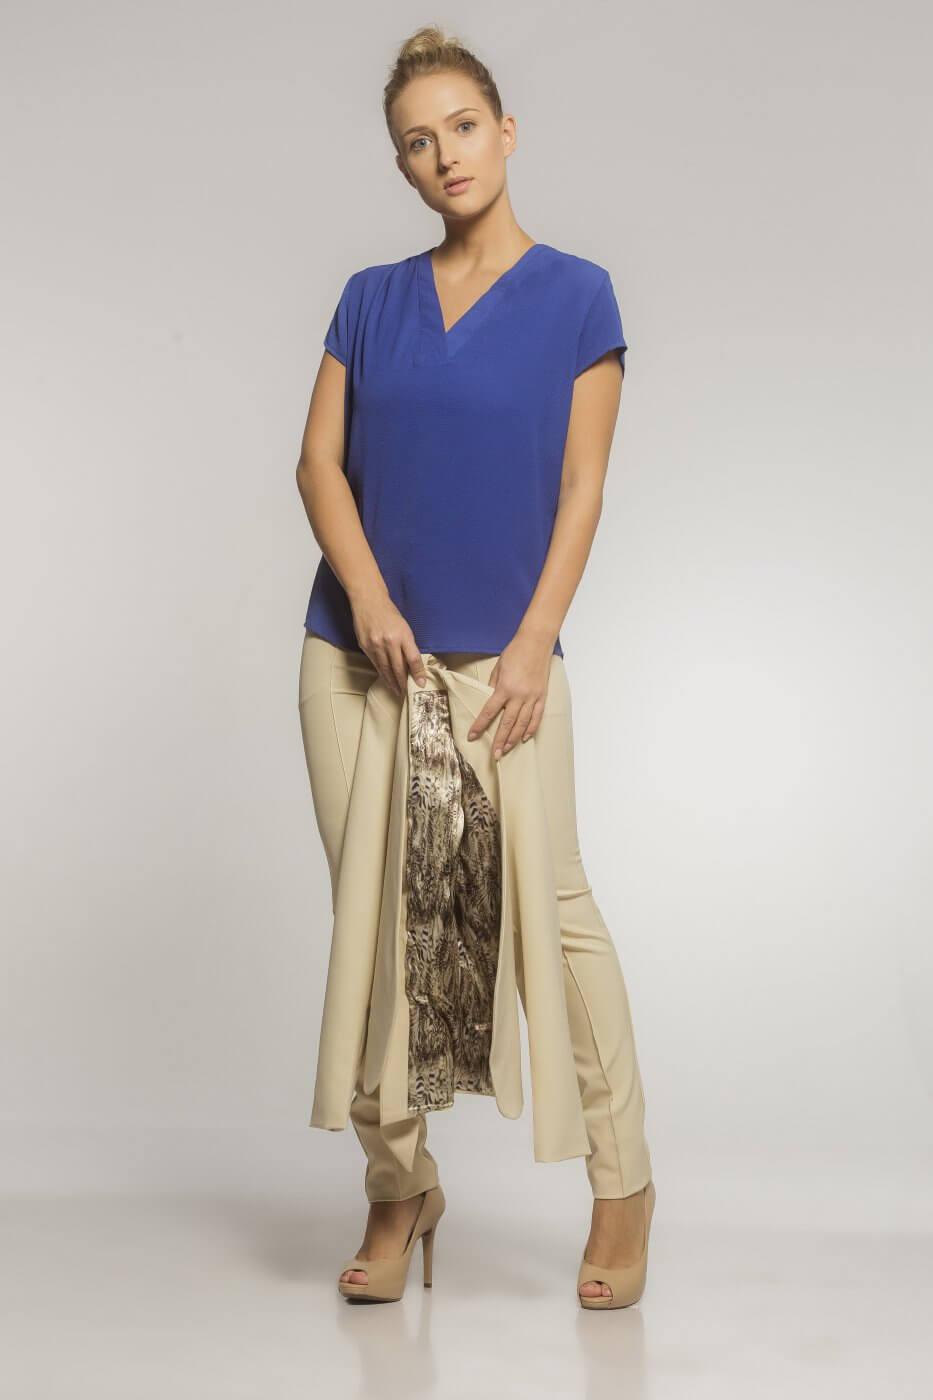 Blusa Social Feminina Decote Gola V Blooms em Crepe Azul Bic